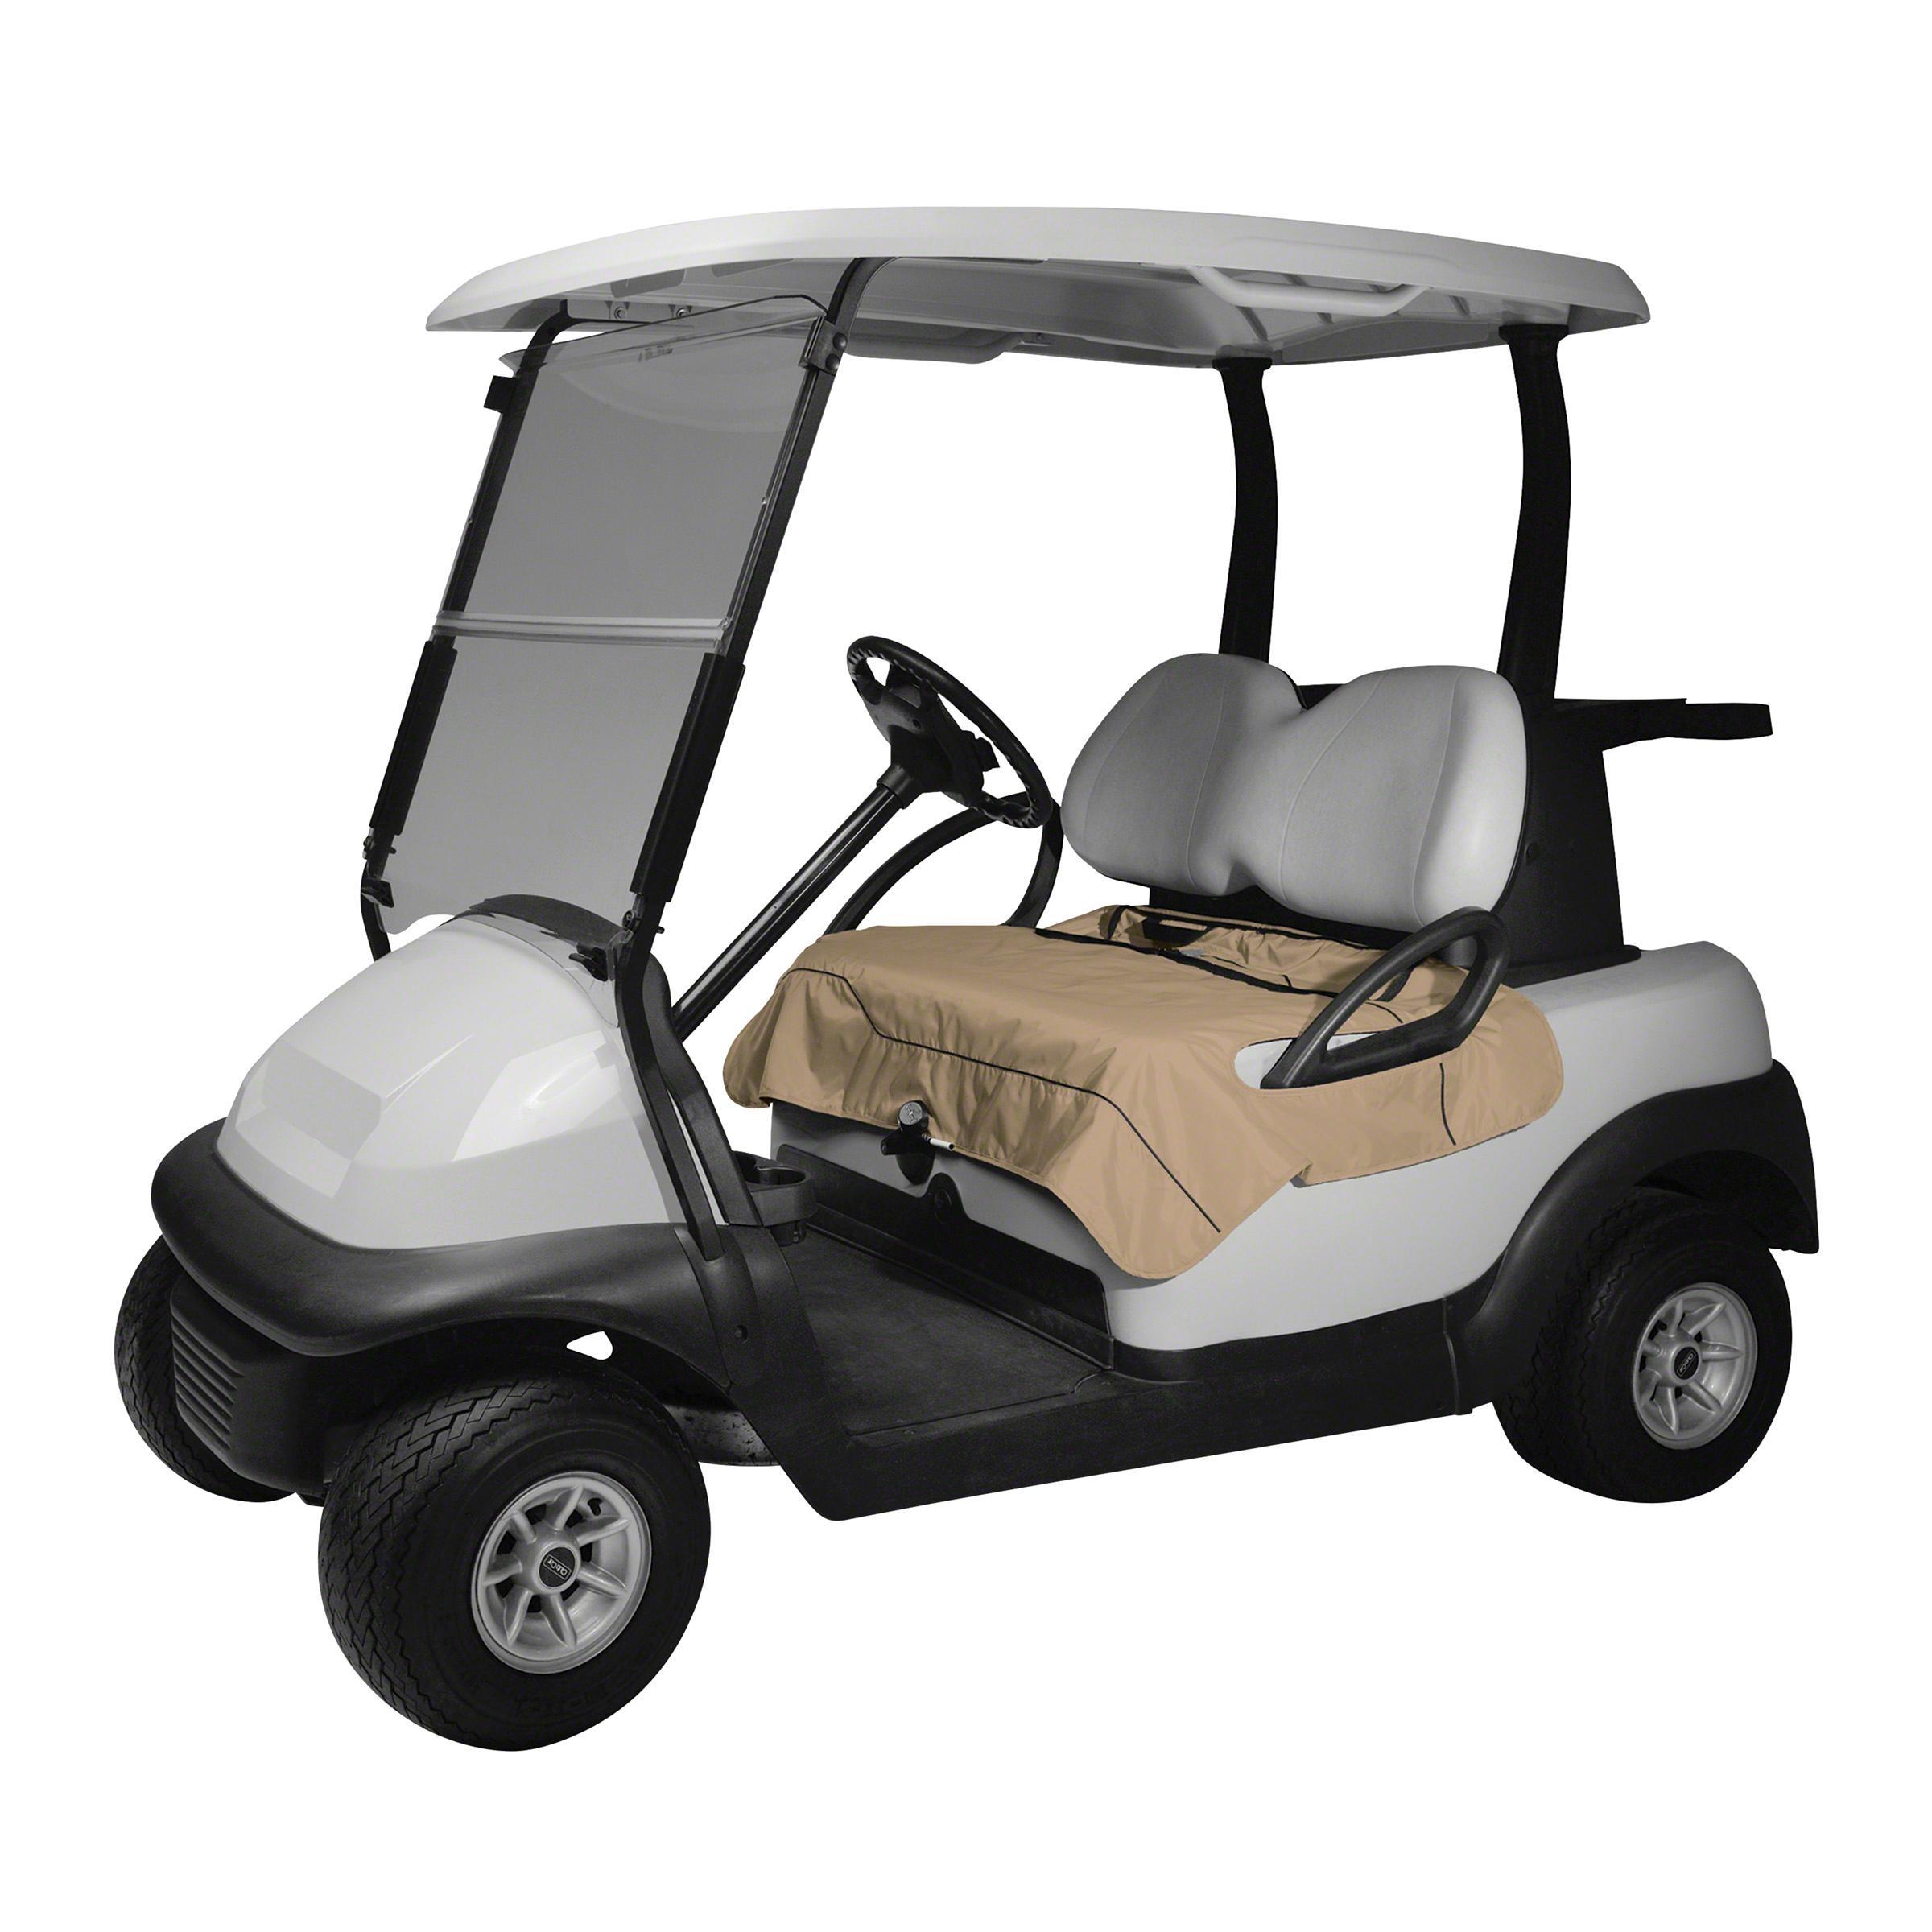 Amazon.com : Classic AccessoriesAmazon.com : Classic AccessoriesGolf Cart Seat BlanketPlaid :Amazon.com : Classic AccessoriesAmazon.com : Classic AccessoriesGolf Cart Seat BlanketPlaid :Golf CartAccessories : Sports & Outdoors